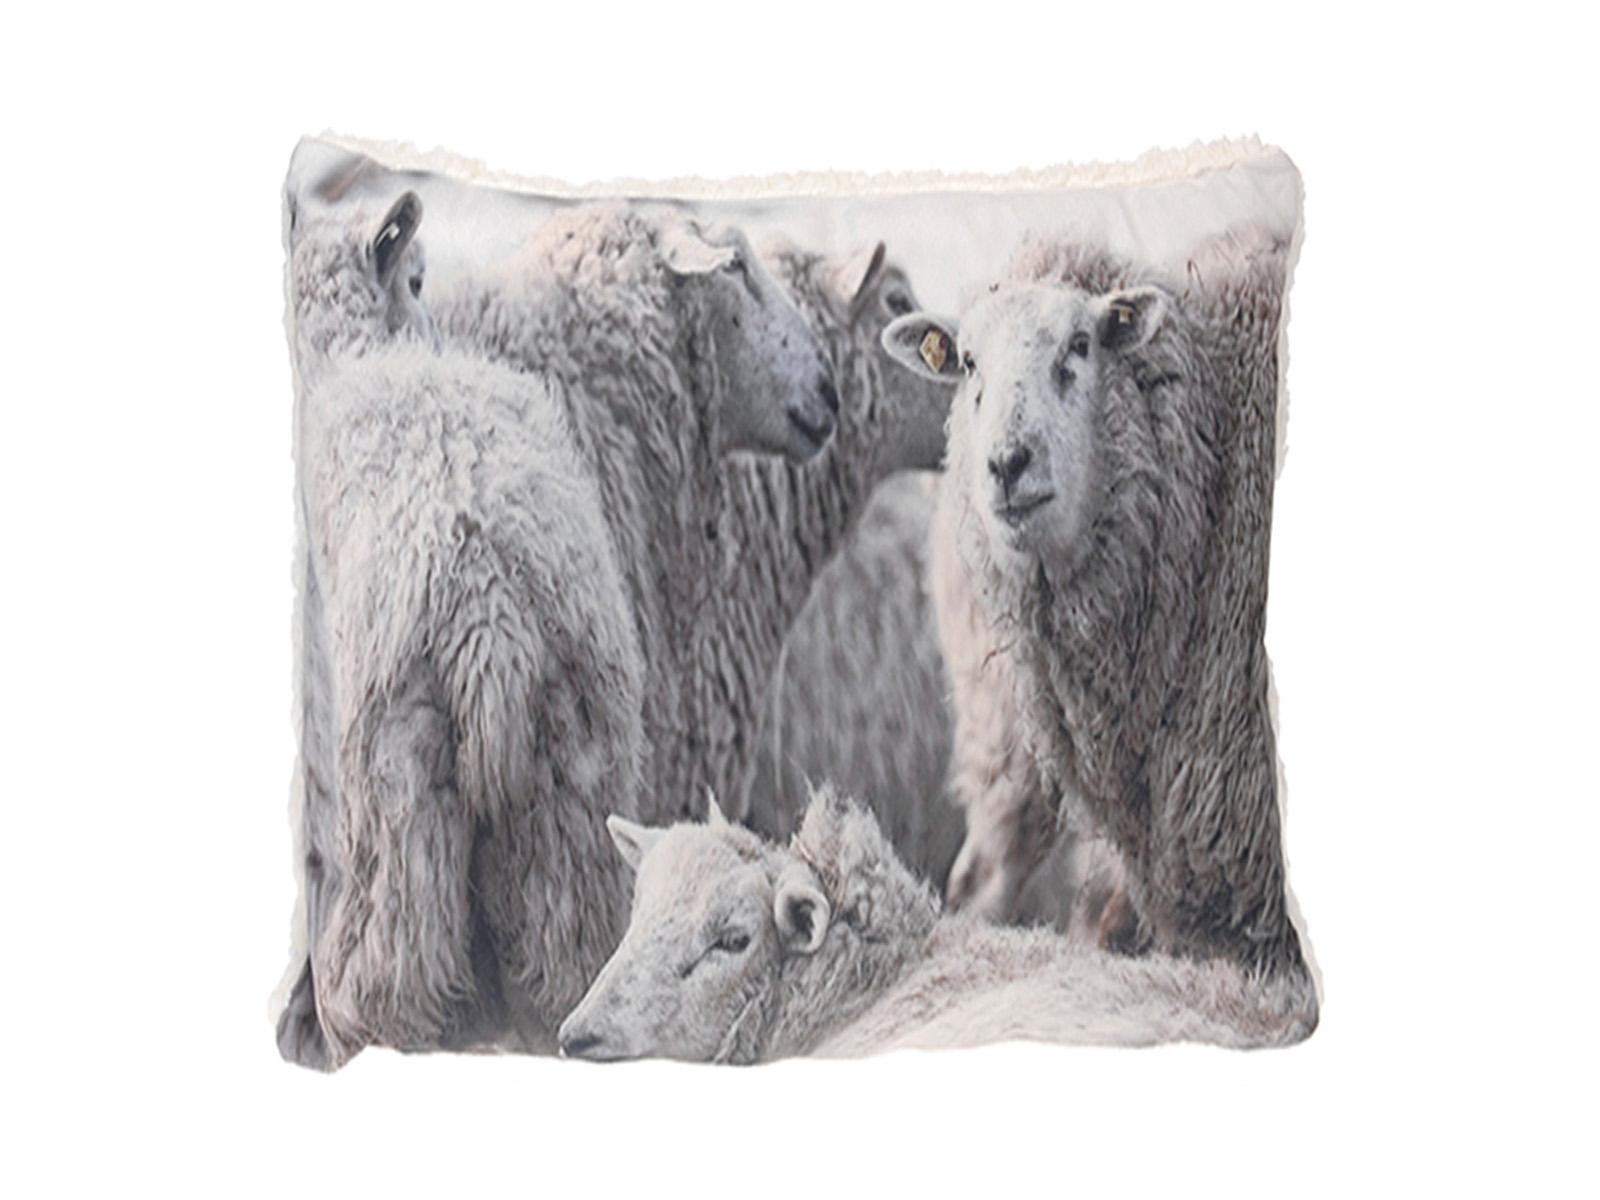 Подушка SheepДекоративные подушки<br>Декоративная подушка<br>